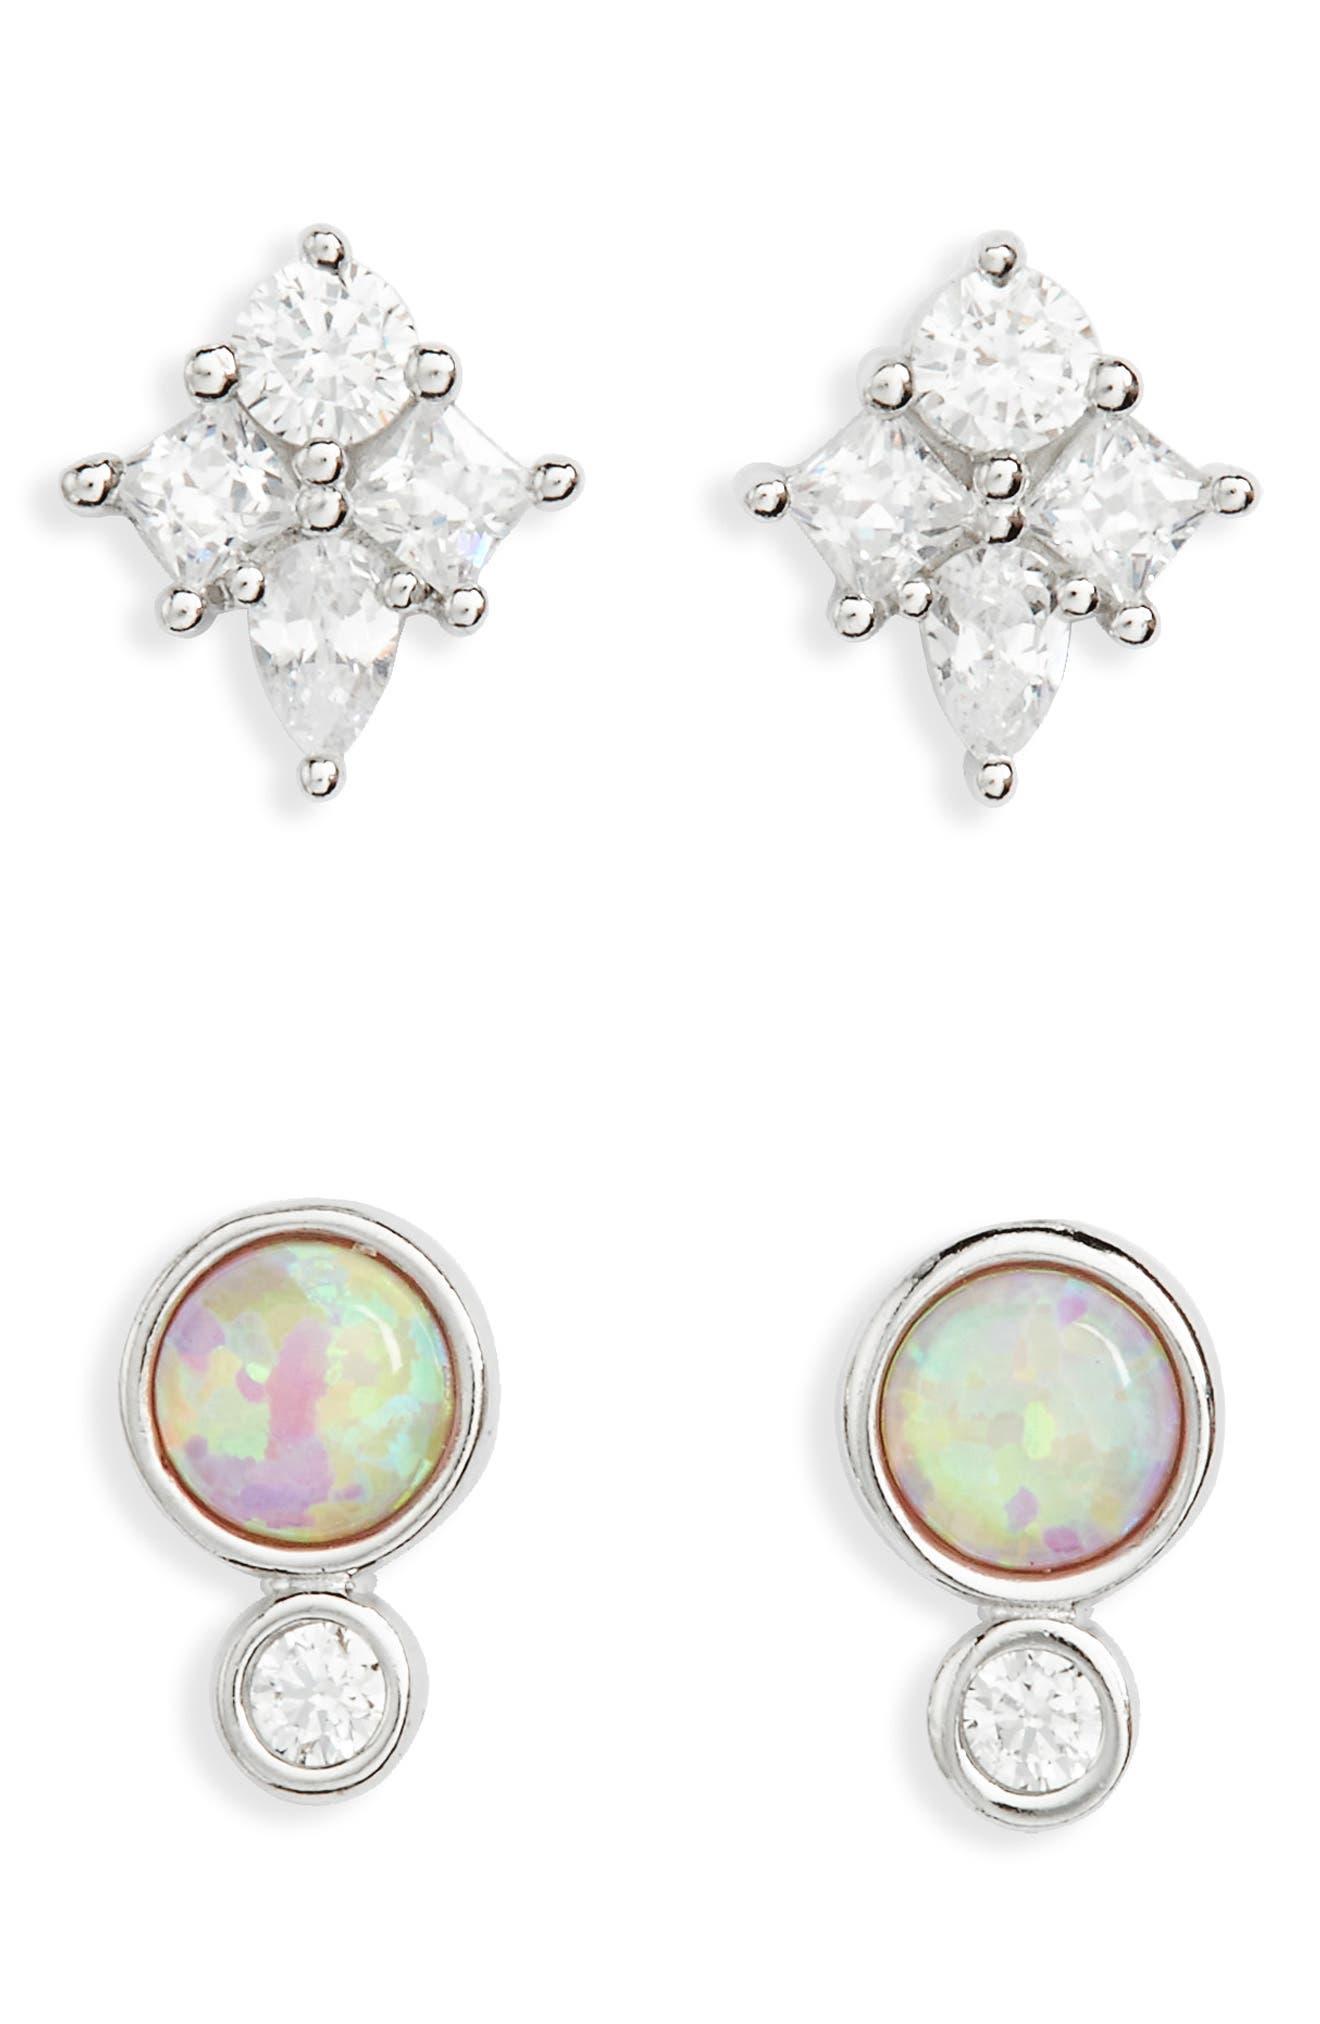 Set of 2 Opal & Cubic Zirconia Stud Earrings,                         Main,                         color, Platinum